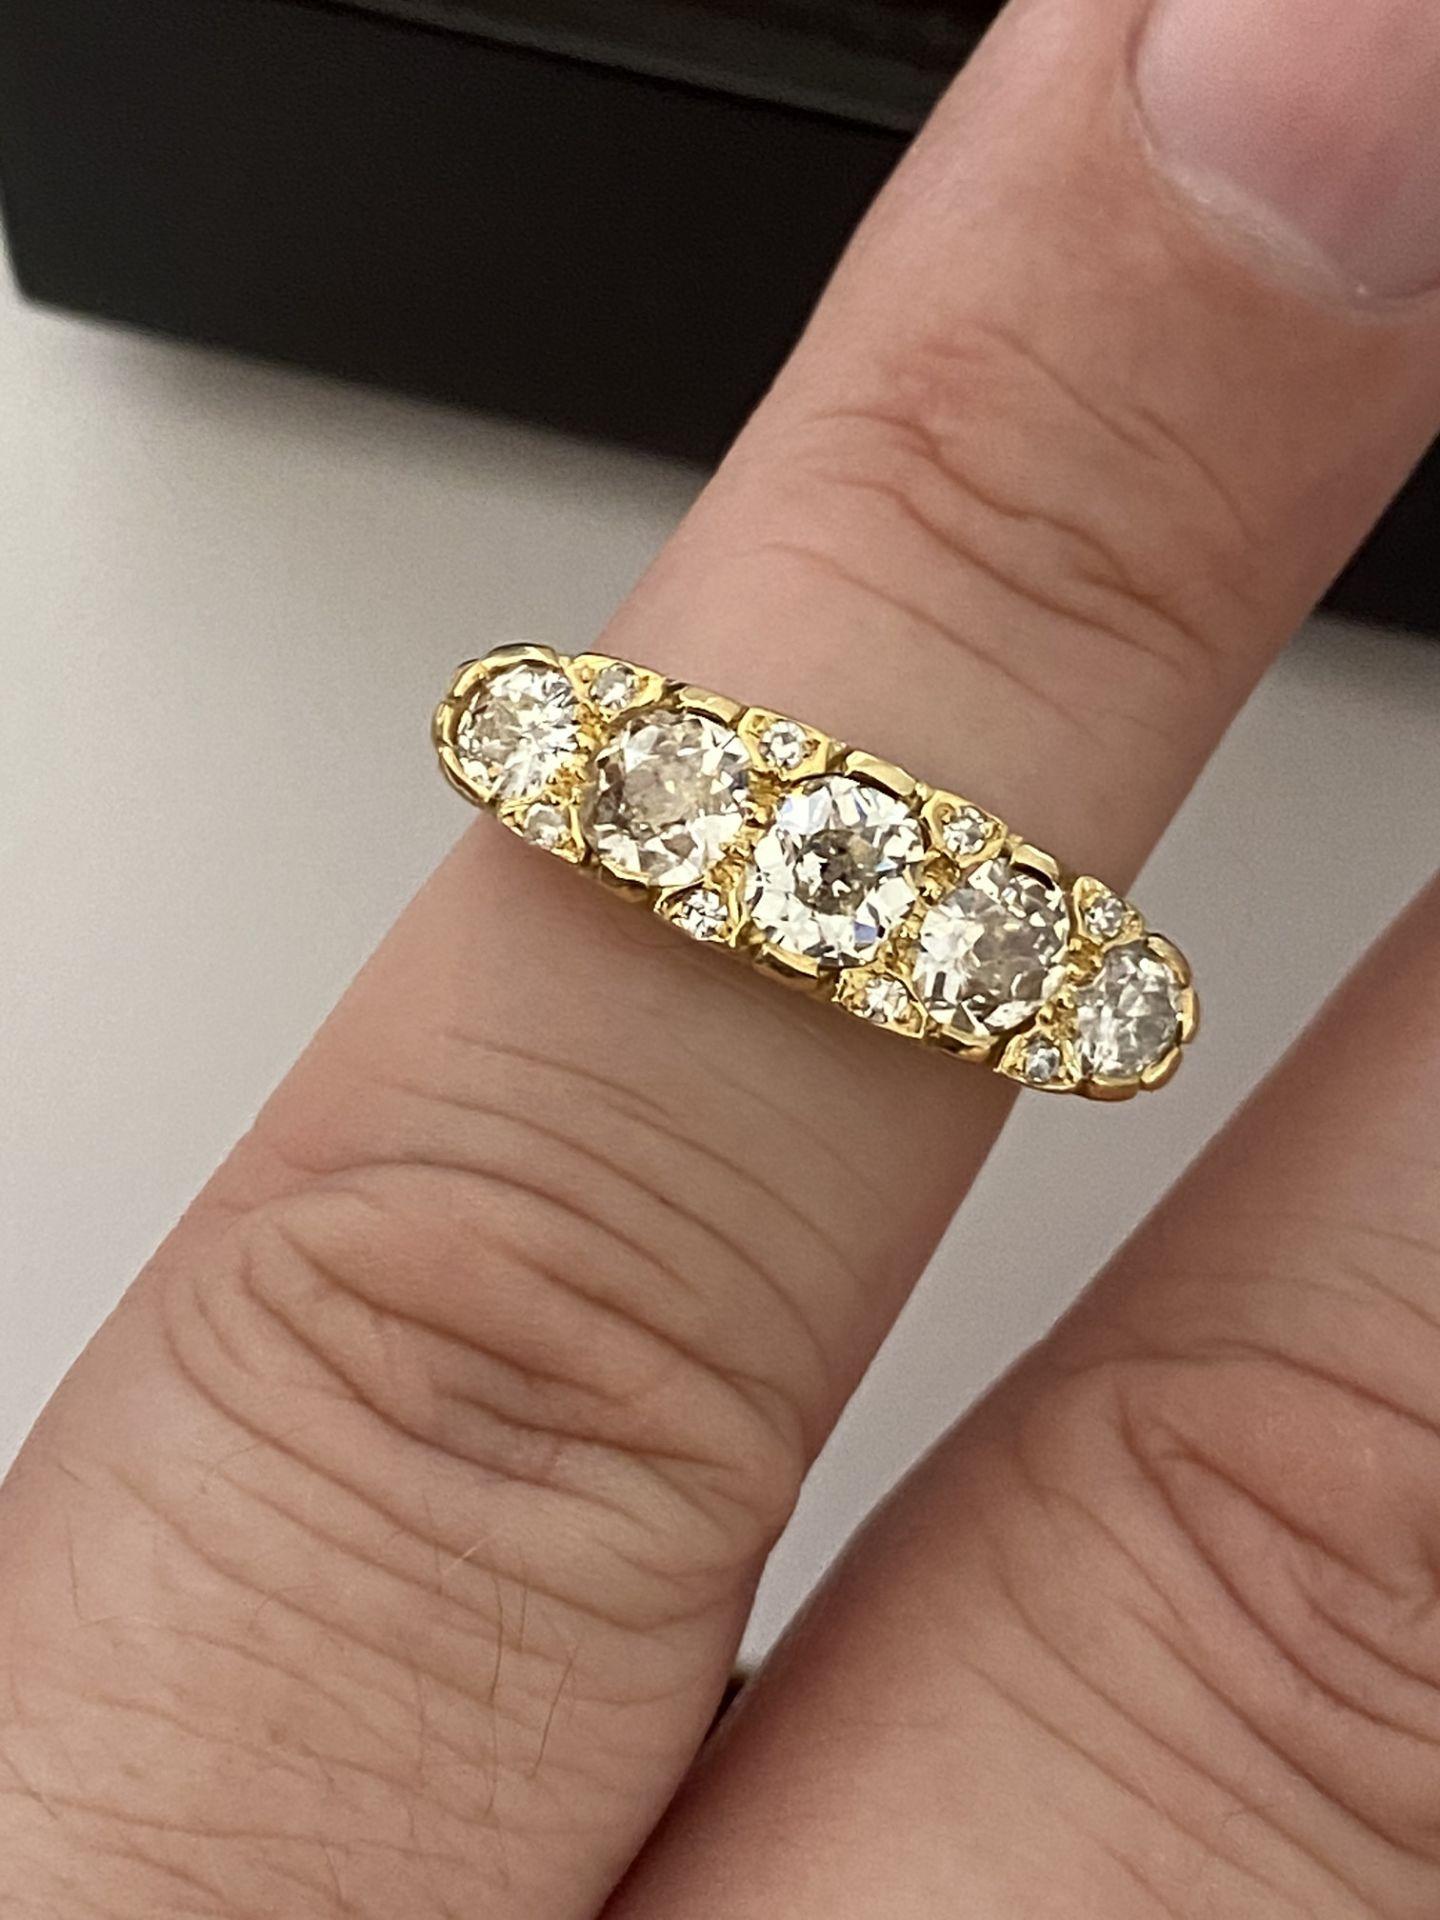 FINE 18ct YELLOW GOLD 2.00ct 5 STONE DIAMOND RING - Image 13 of 15